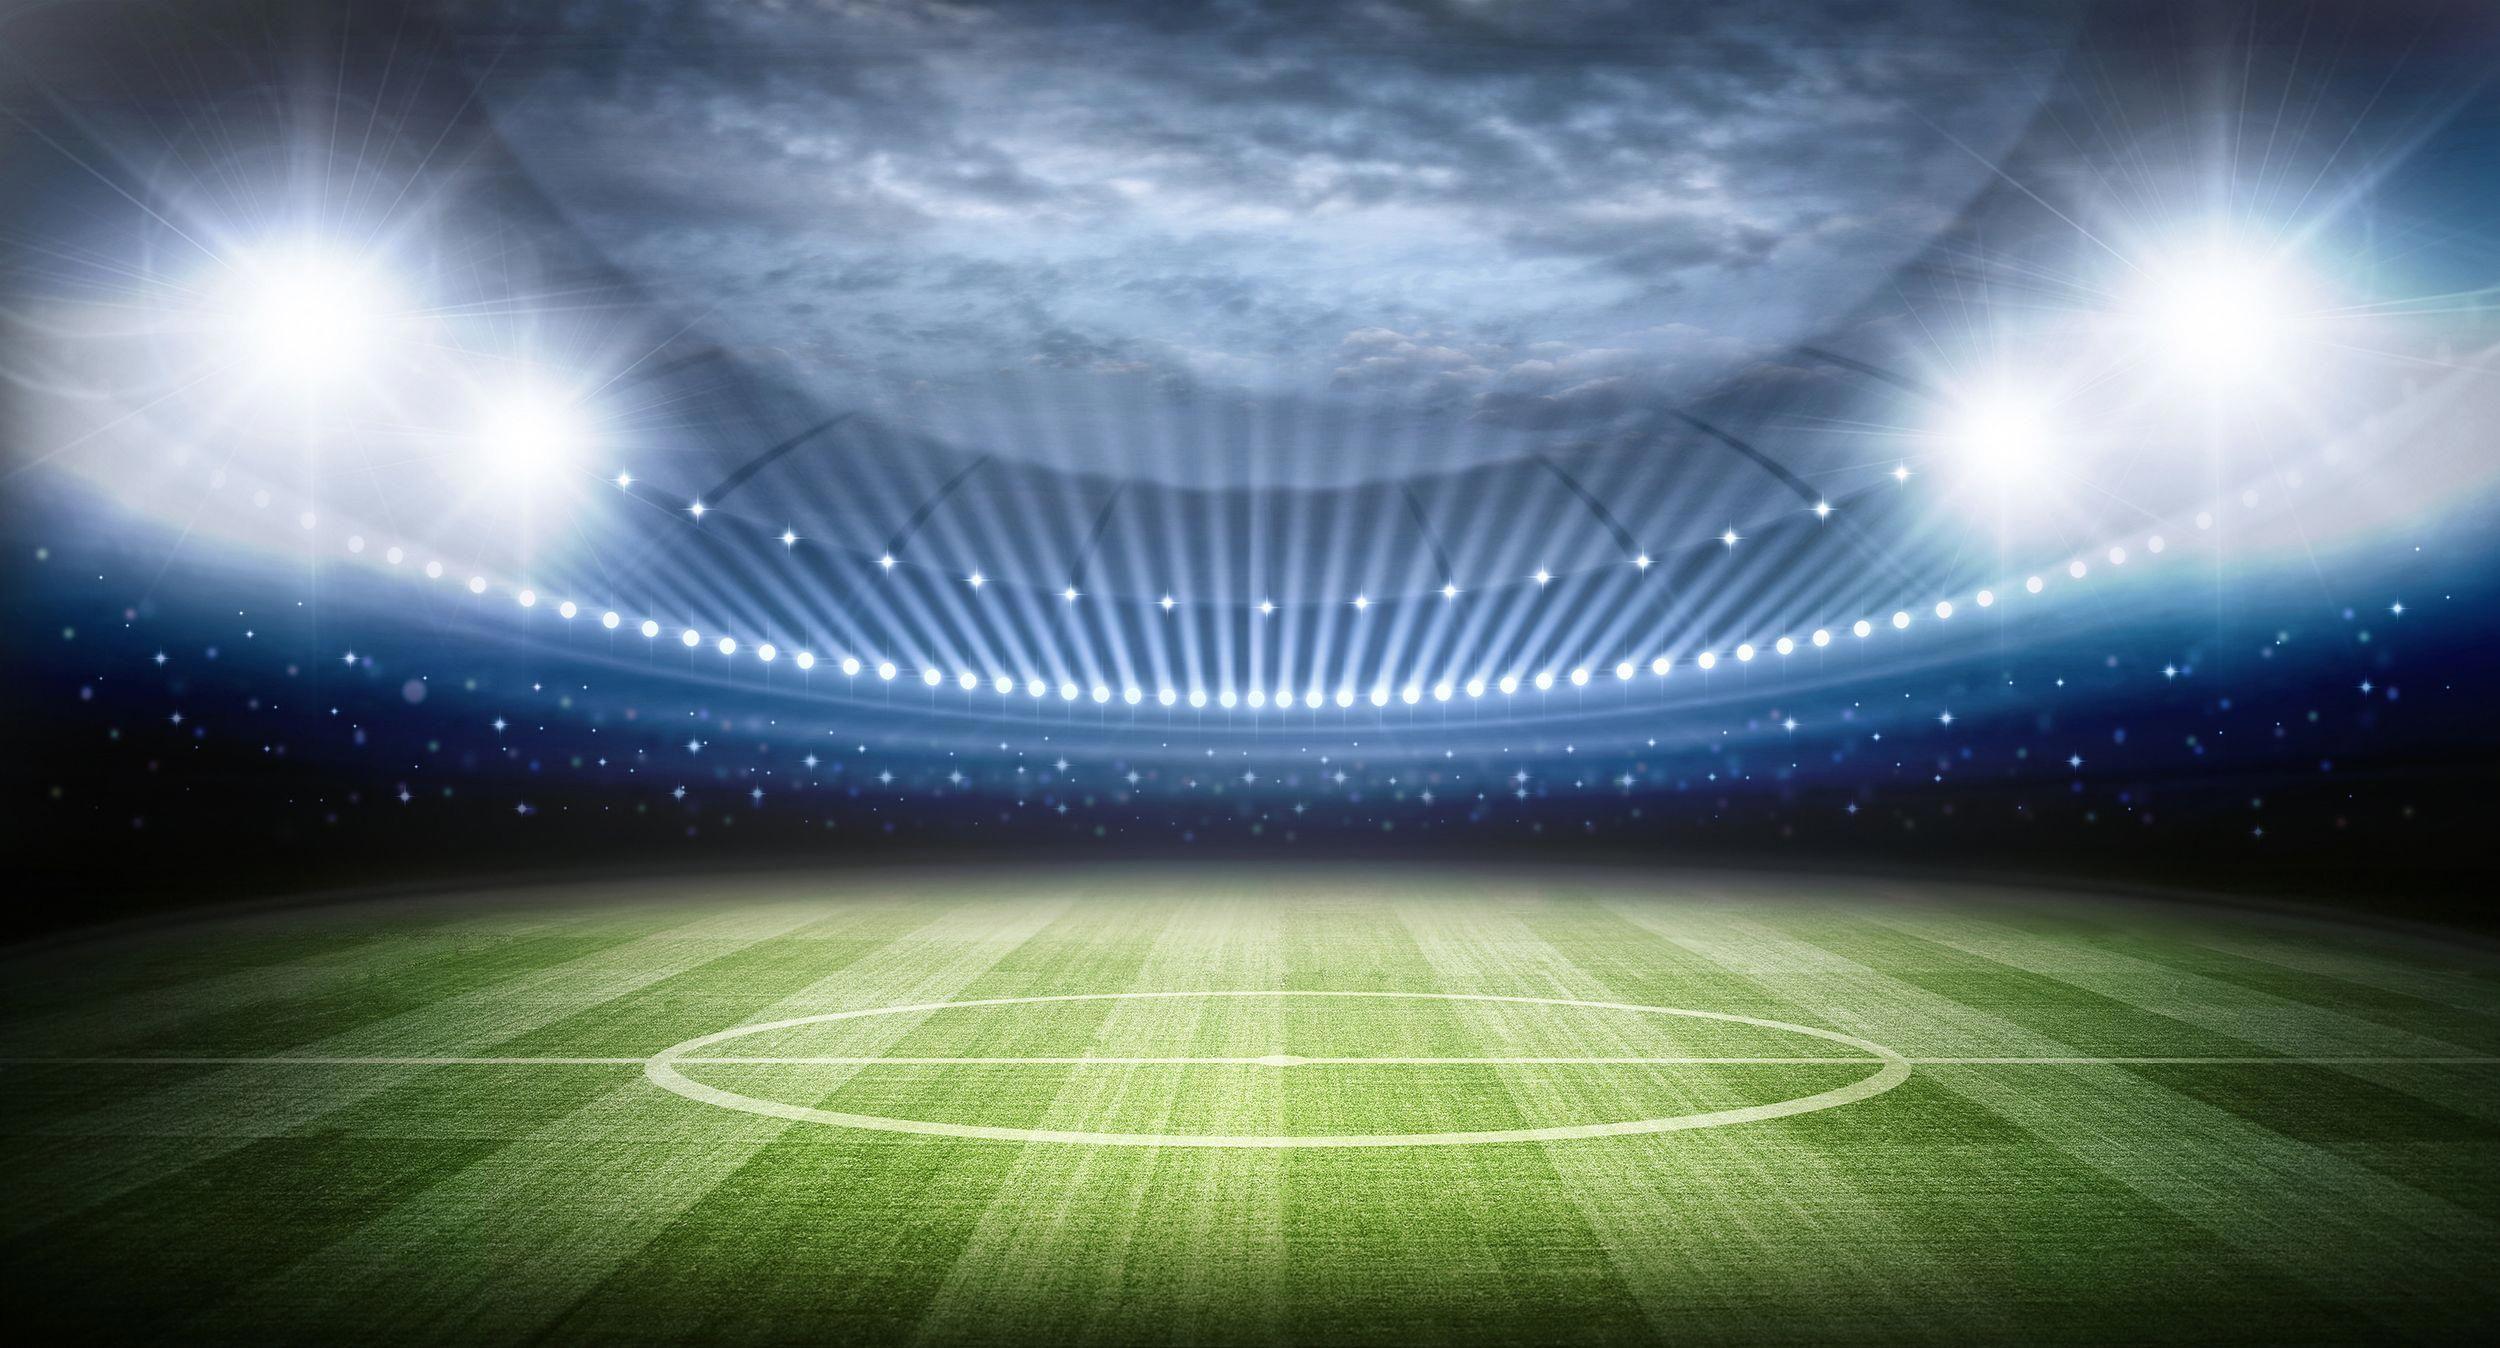 Sport Football Background Image Football Background Background Images Sport Football